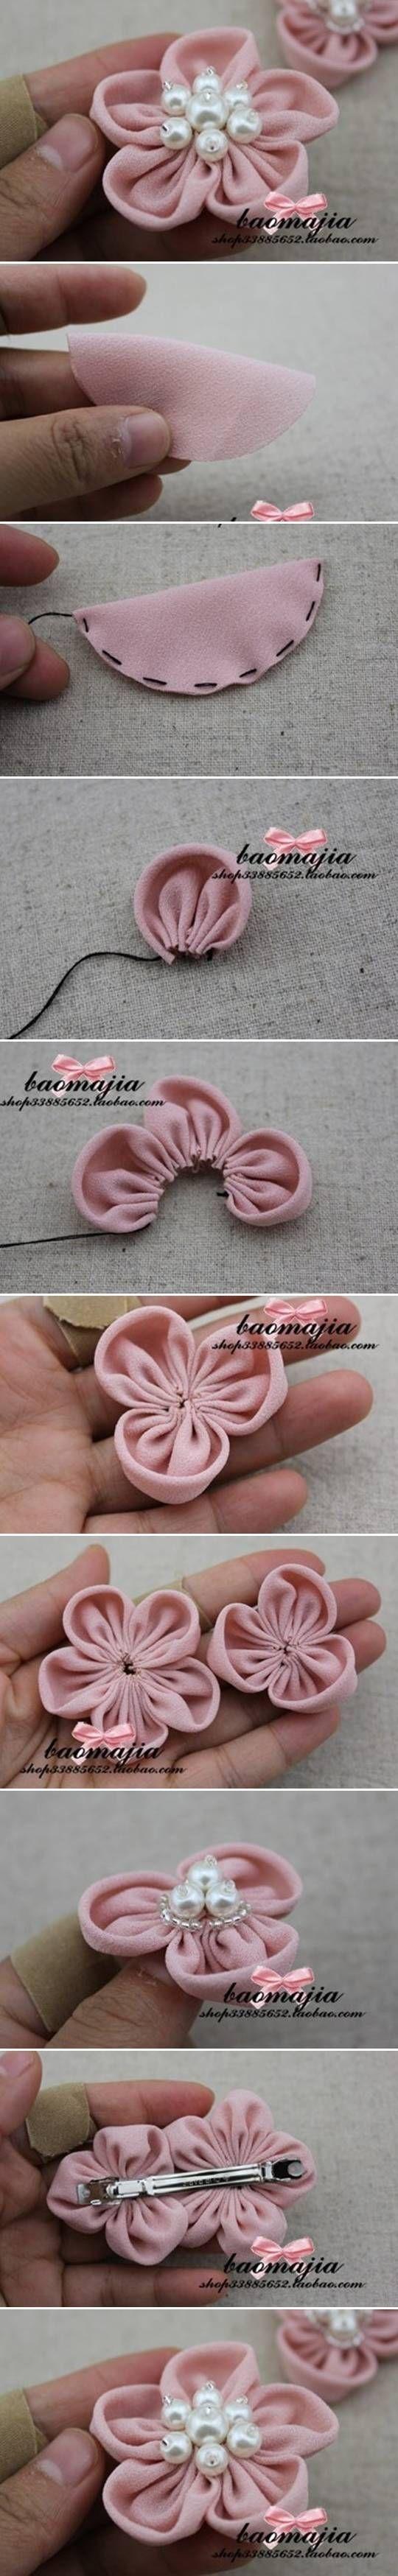 DIY Nice Fabric Flower Hair Clip by Patricia Farlee